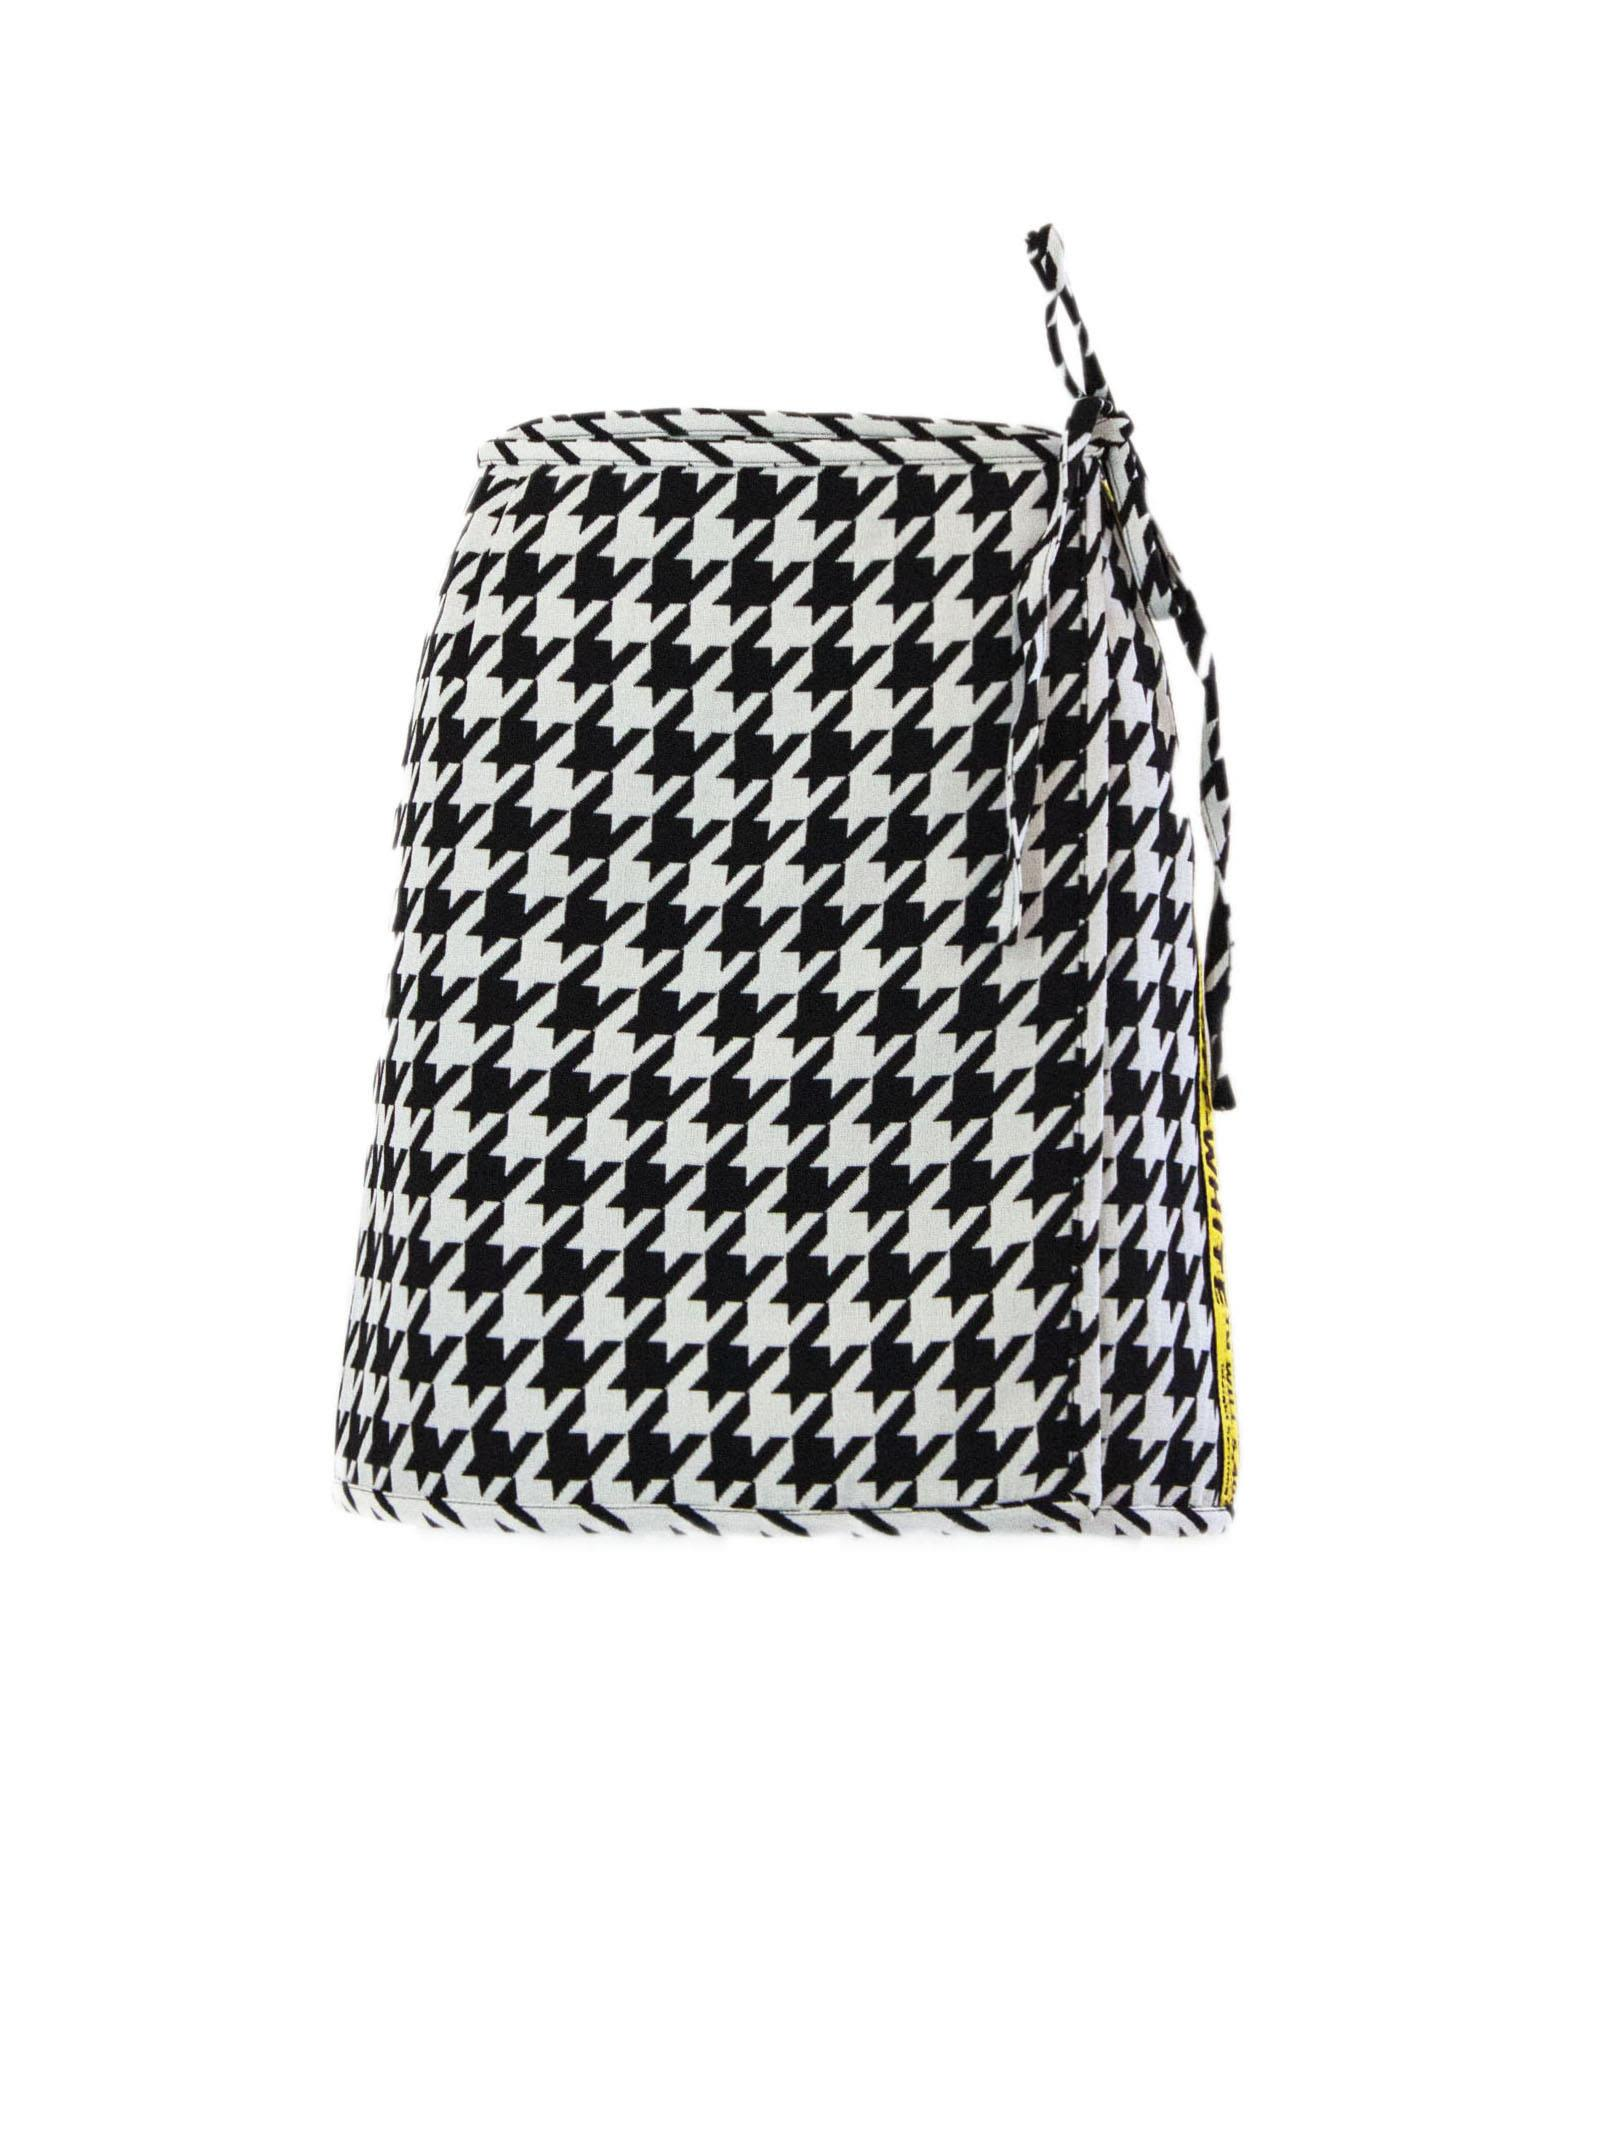 Off-White Checked Mini Skirt In Black And White Virgin Wool.